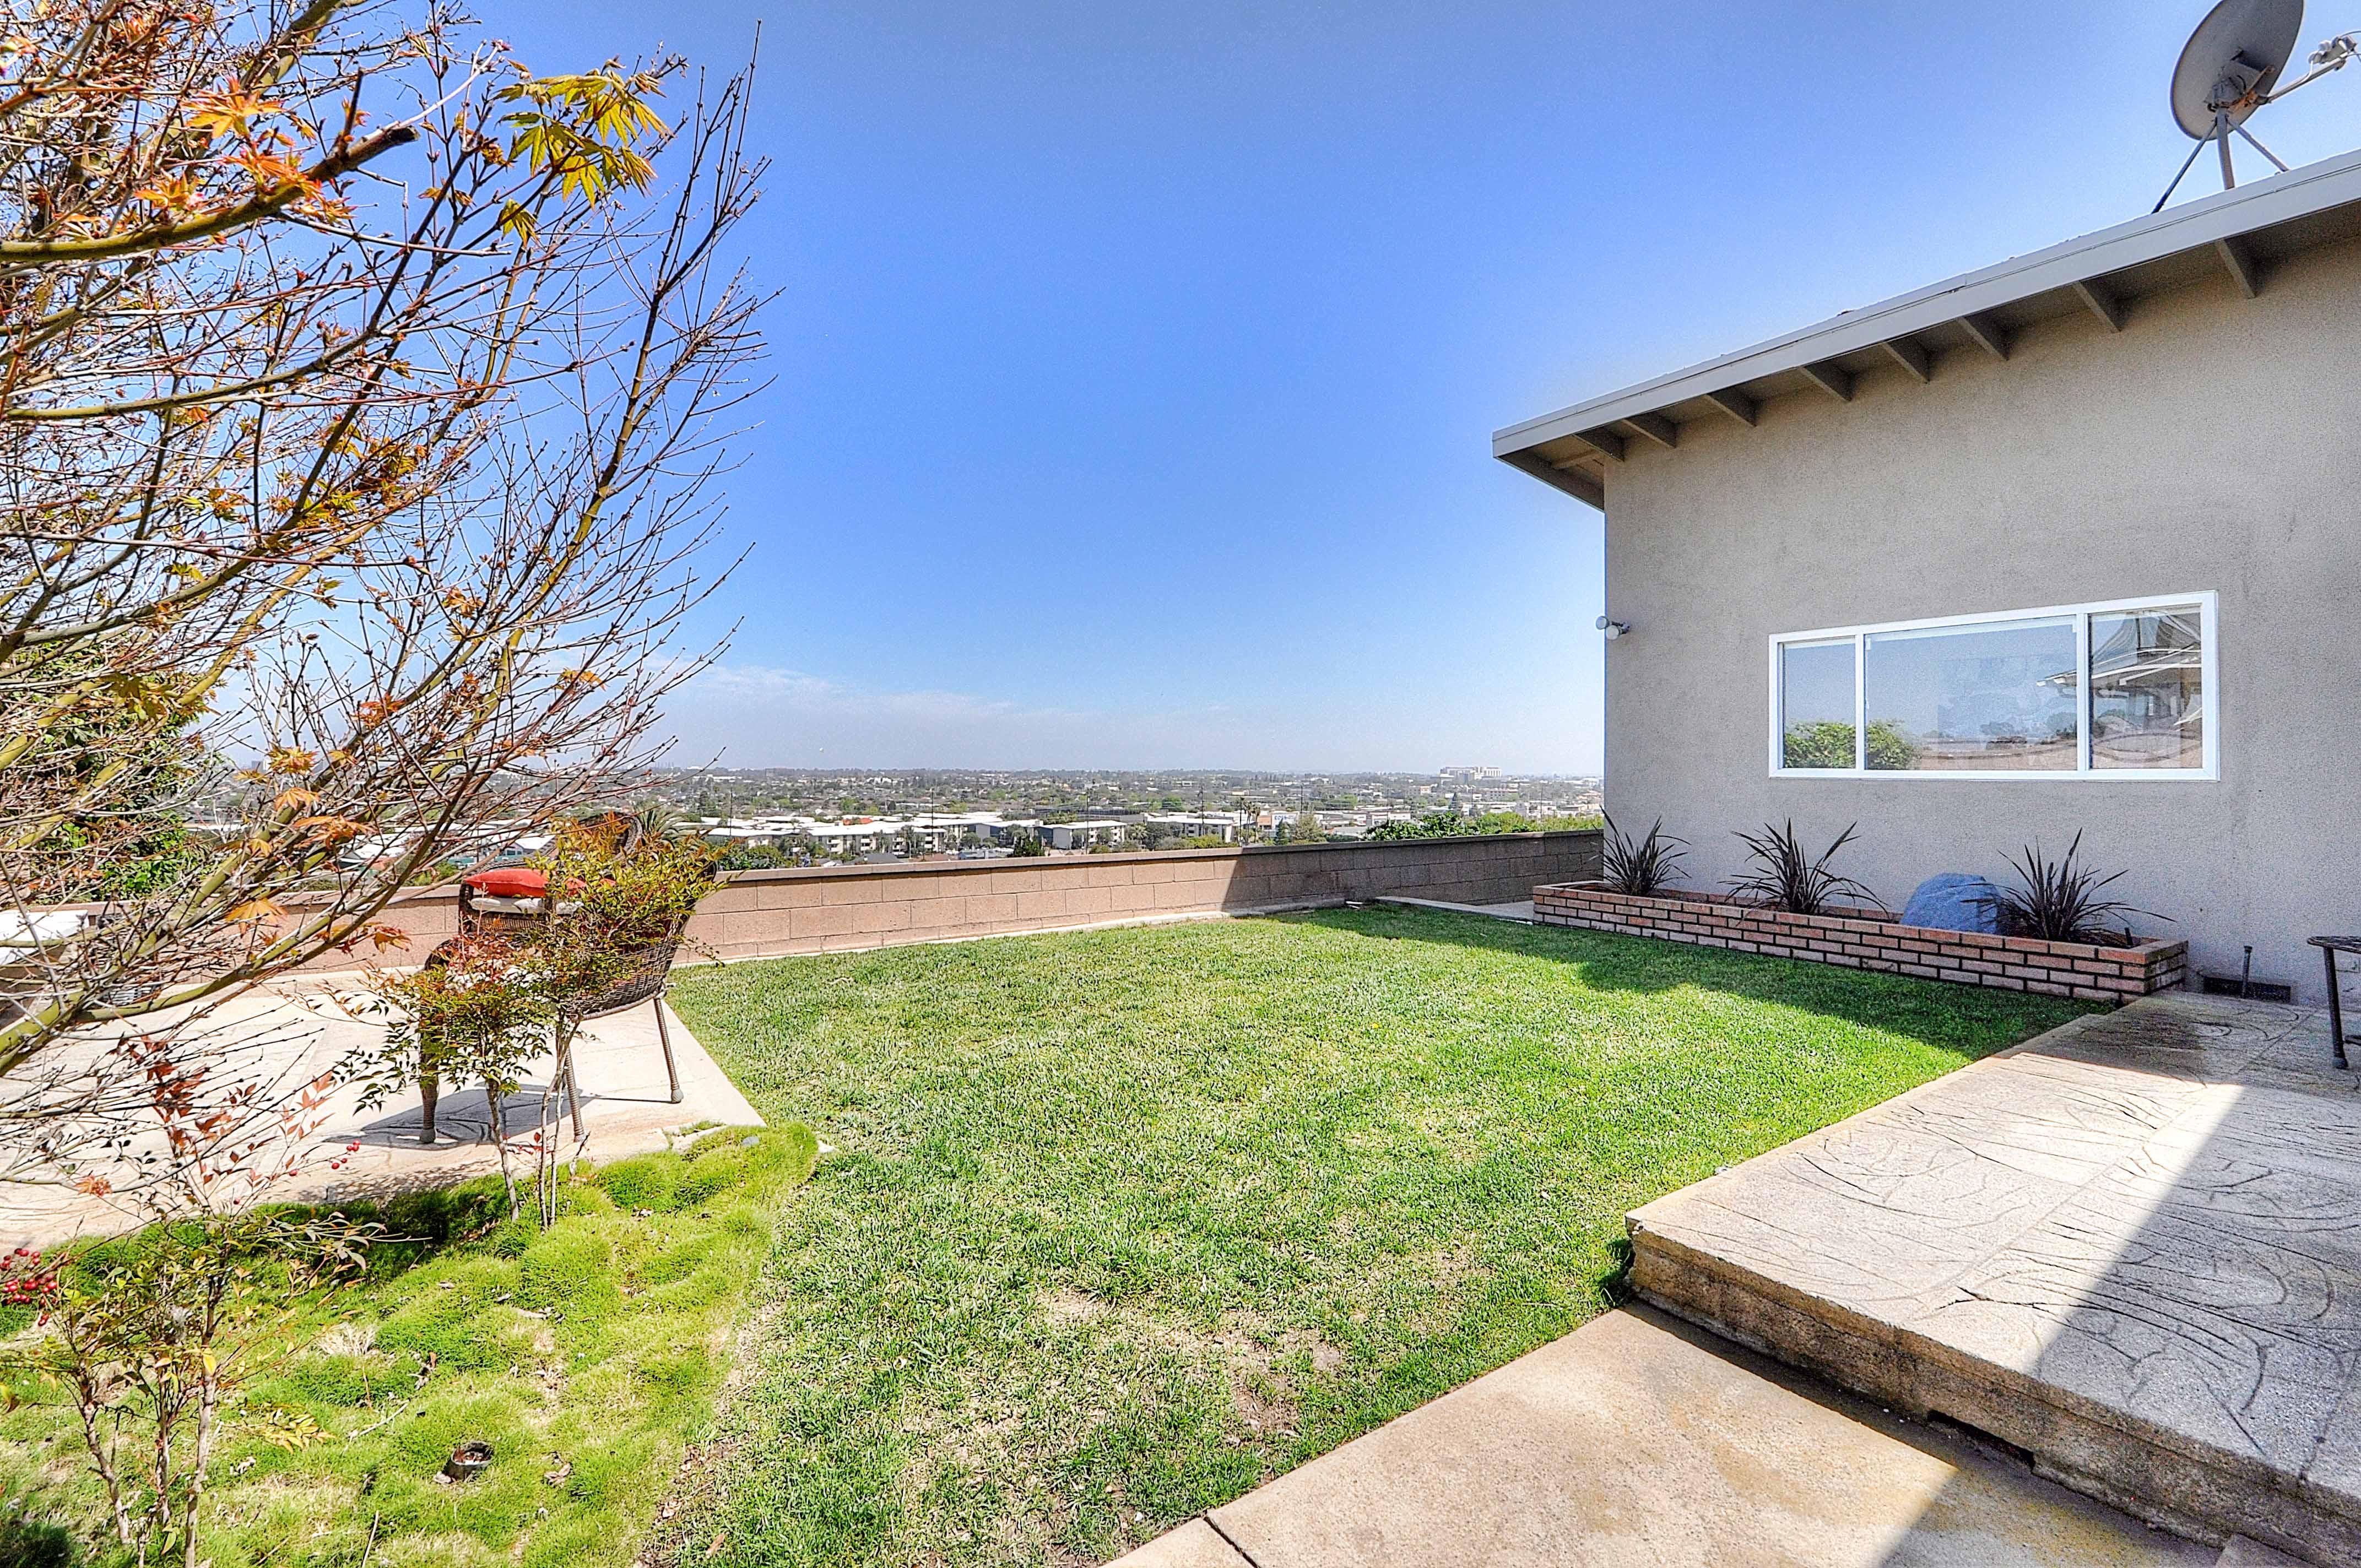 4515-Vista-Largo-backyard3-Copy